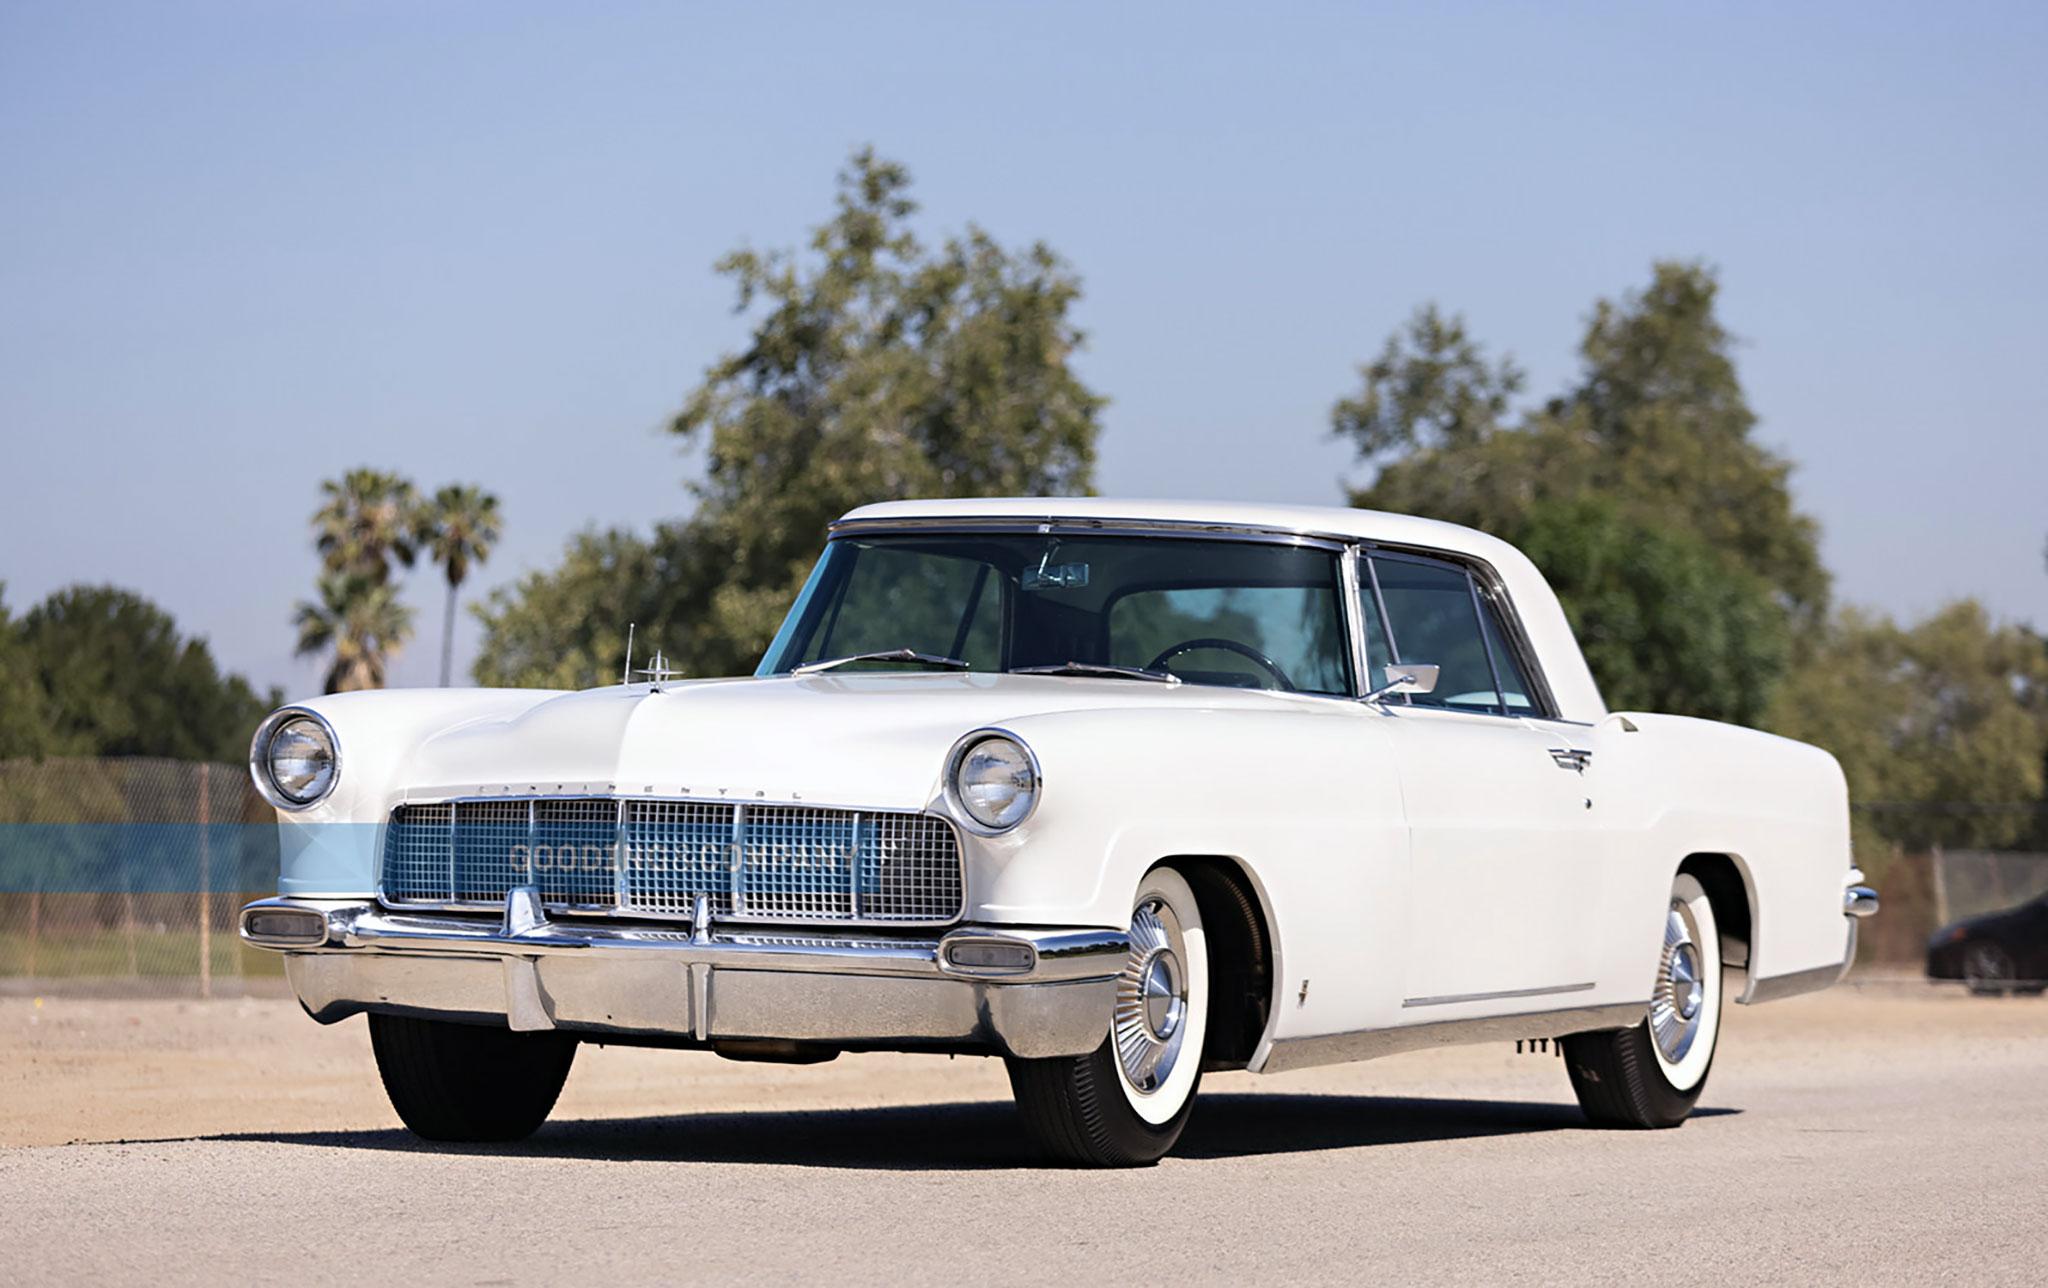 1956 Continental Mark II Gooding & Company CHF 40 000. Marché de la Voiture de Collection.